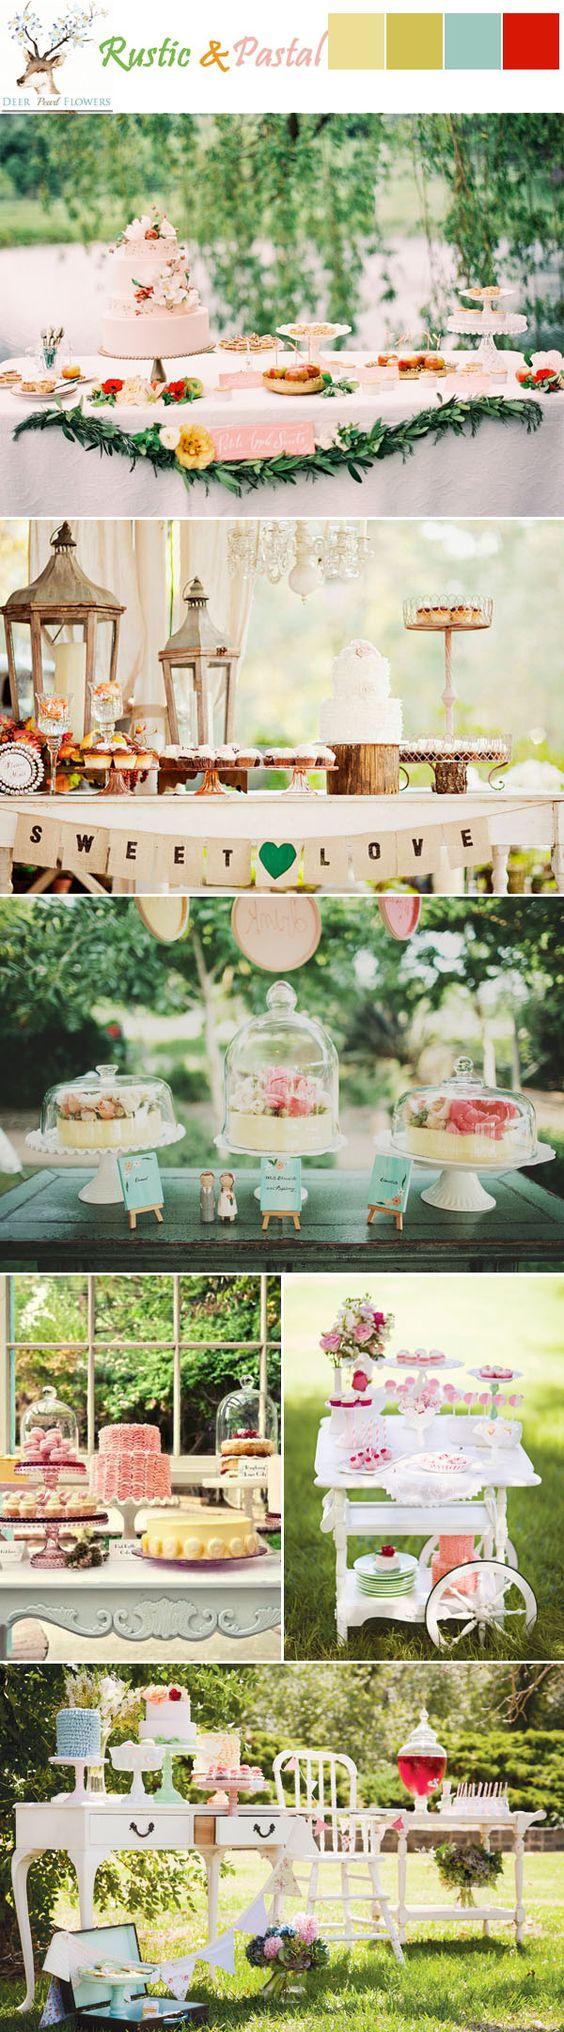 38 Ideas para mesa de postres http://www.deerpearlflowers.com/38-adorable-wedding-dessert-table-ideas/